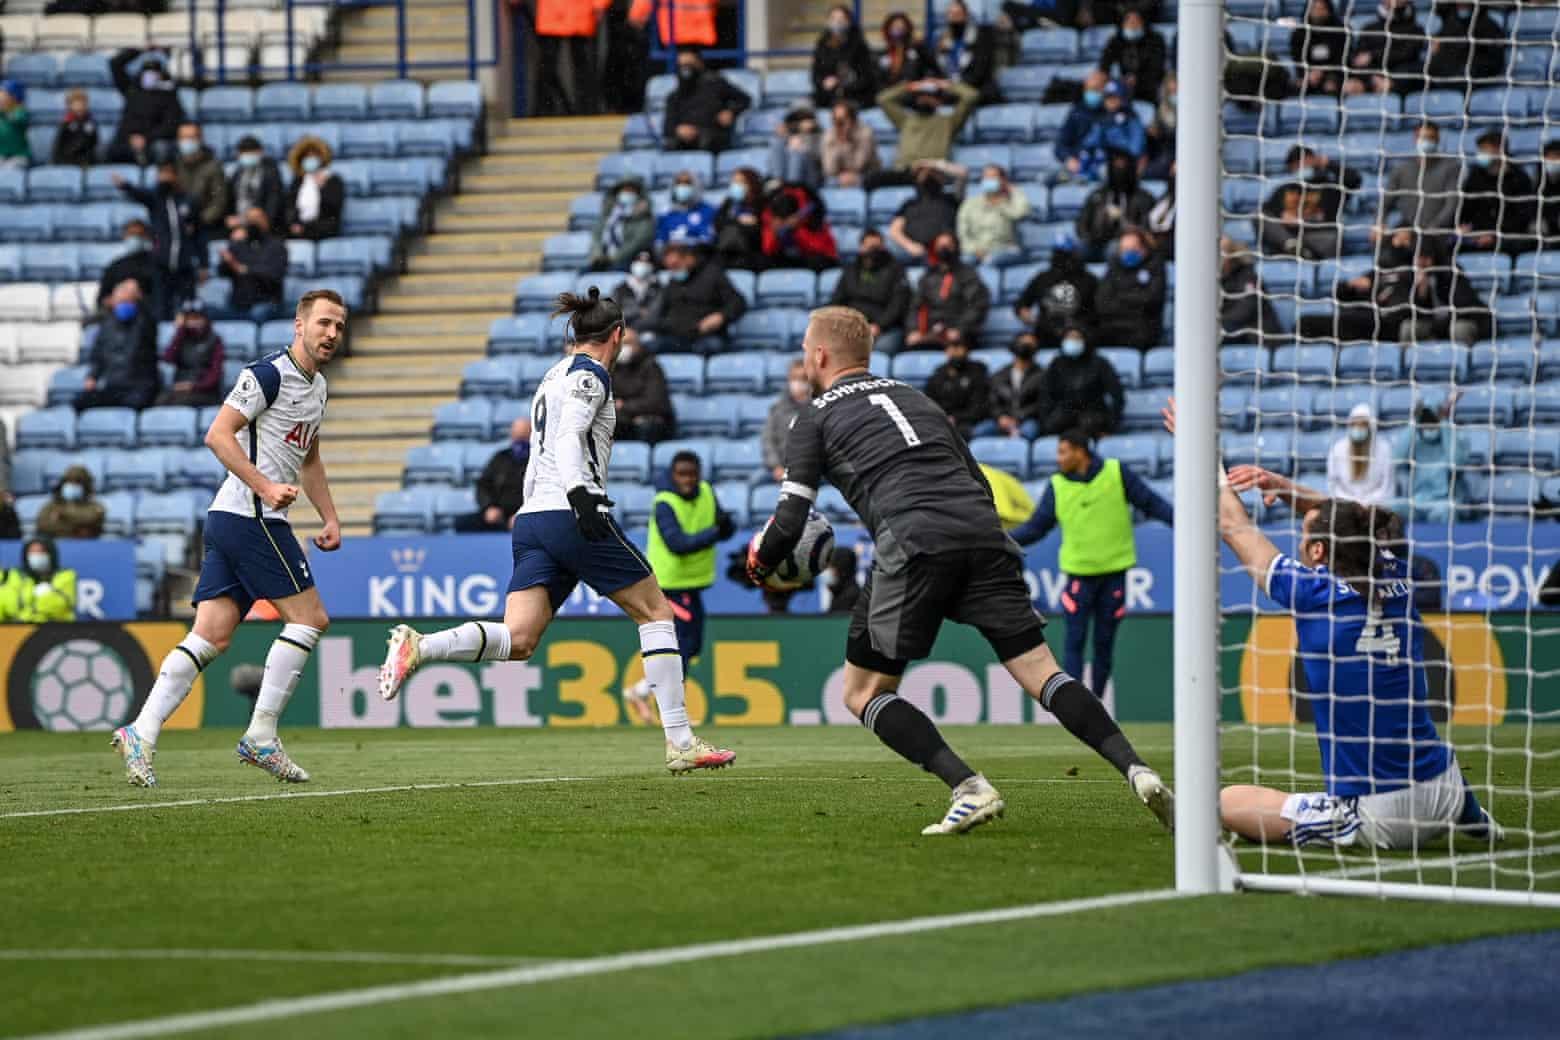 Kane berbagi kegembiraannya setelah membantu Bale menjadikannya 3-2 melawan Leicester.  Foto: EPA